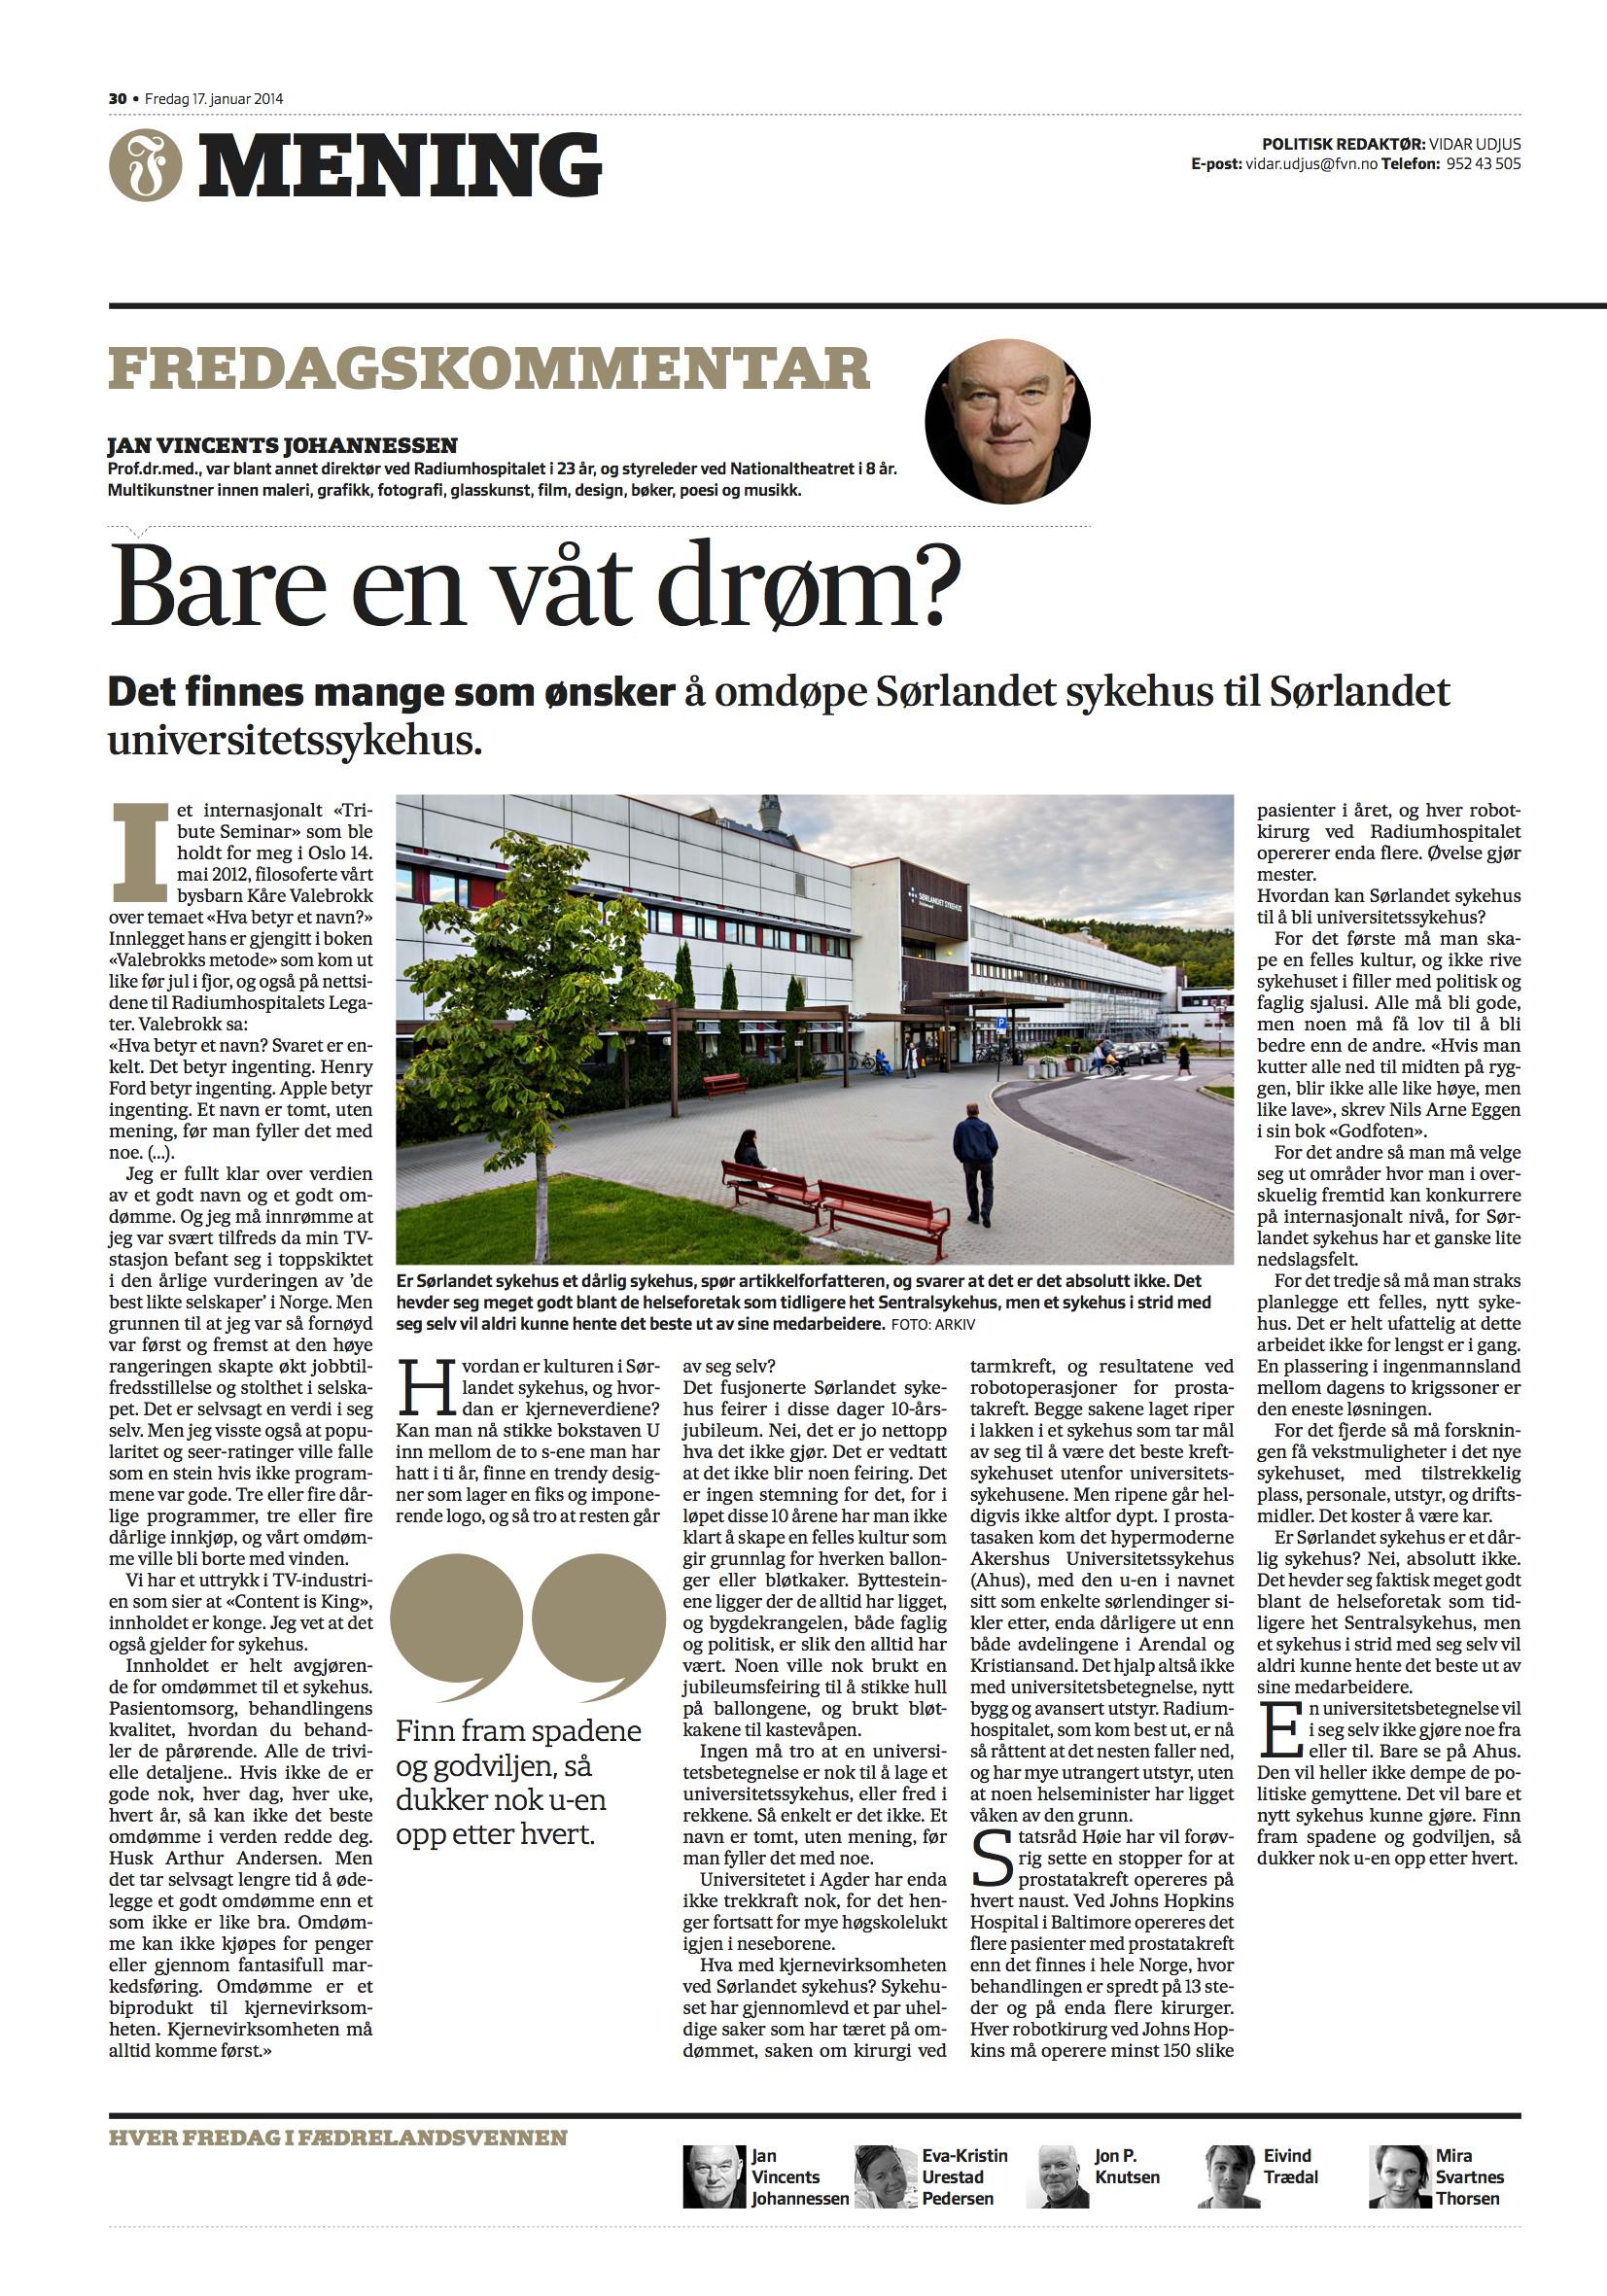 Jan Vincents Johannessen - fredagskommentar 17.01.14